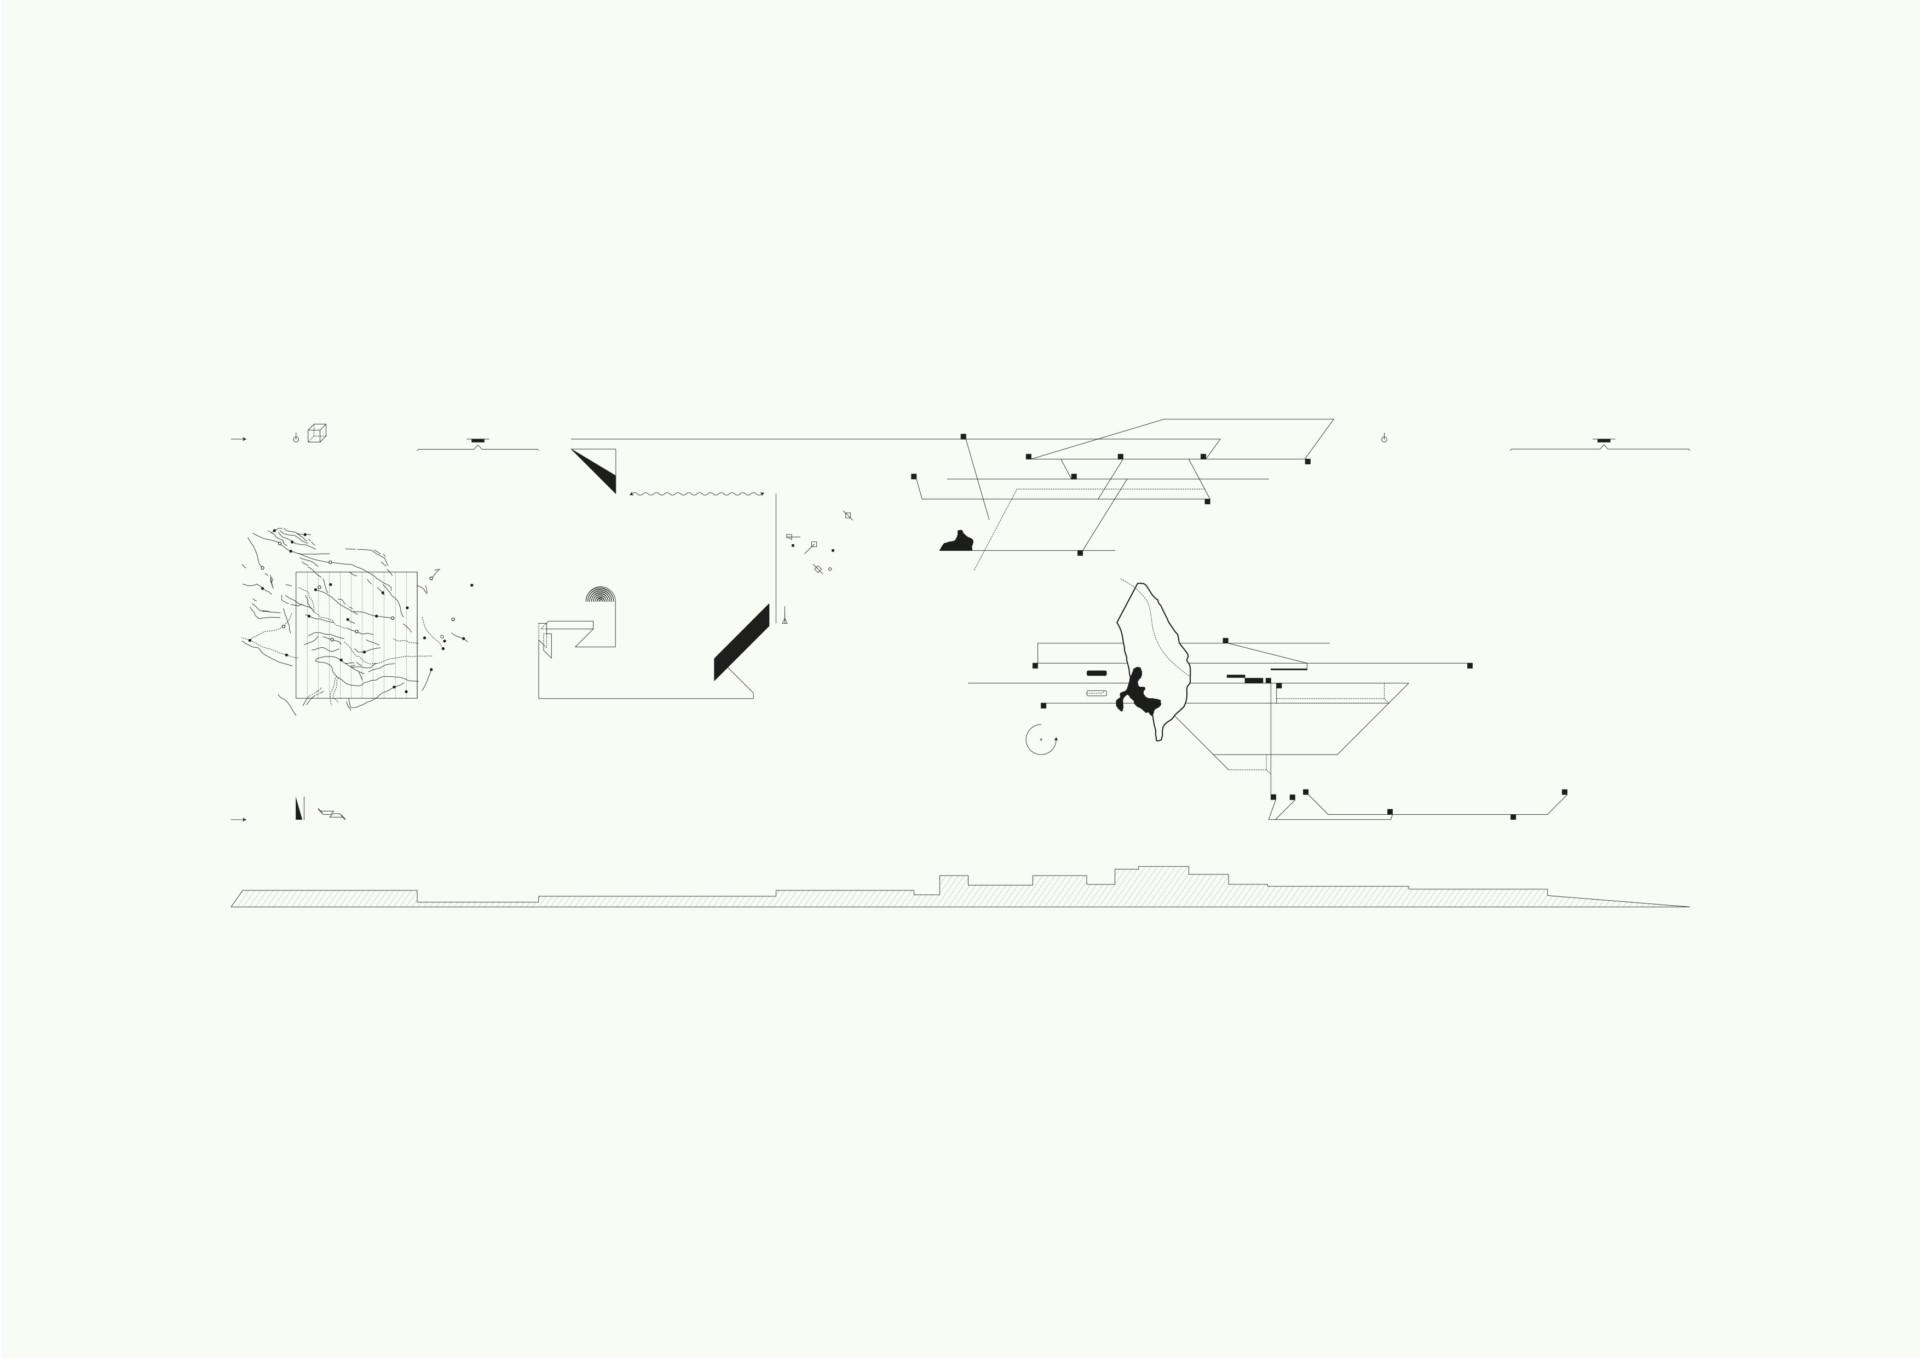 Matthias Urban Projects